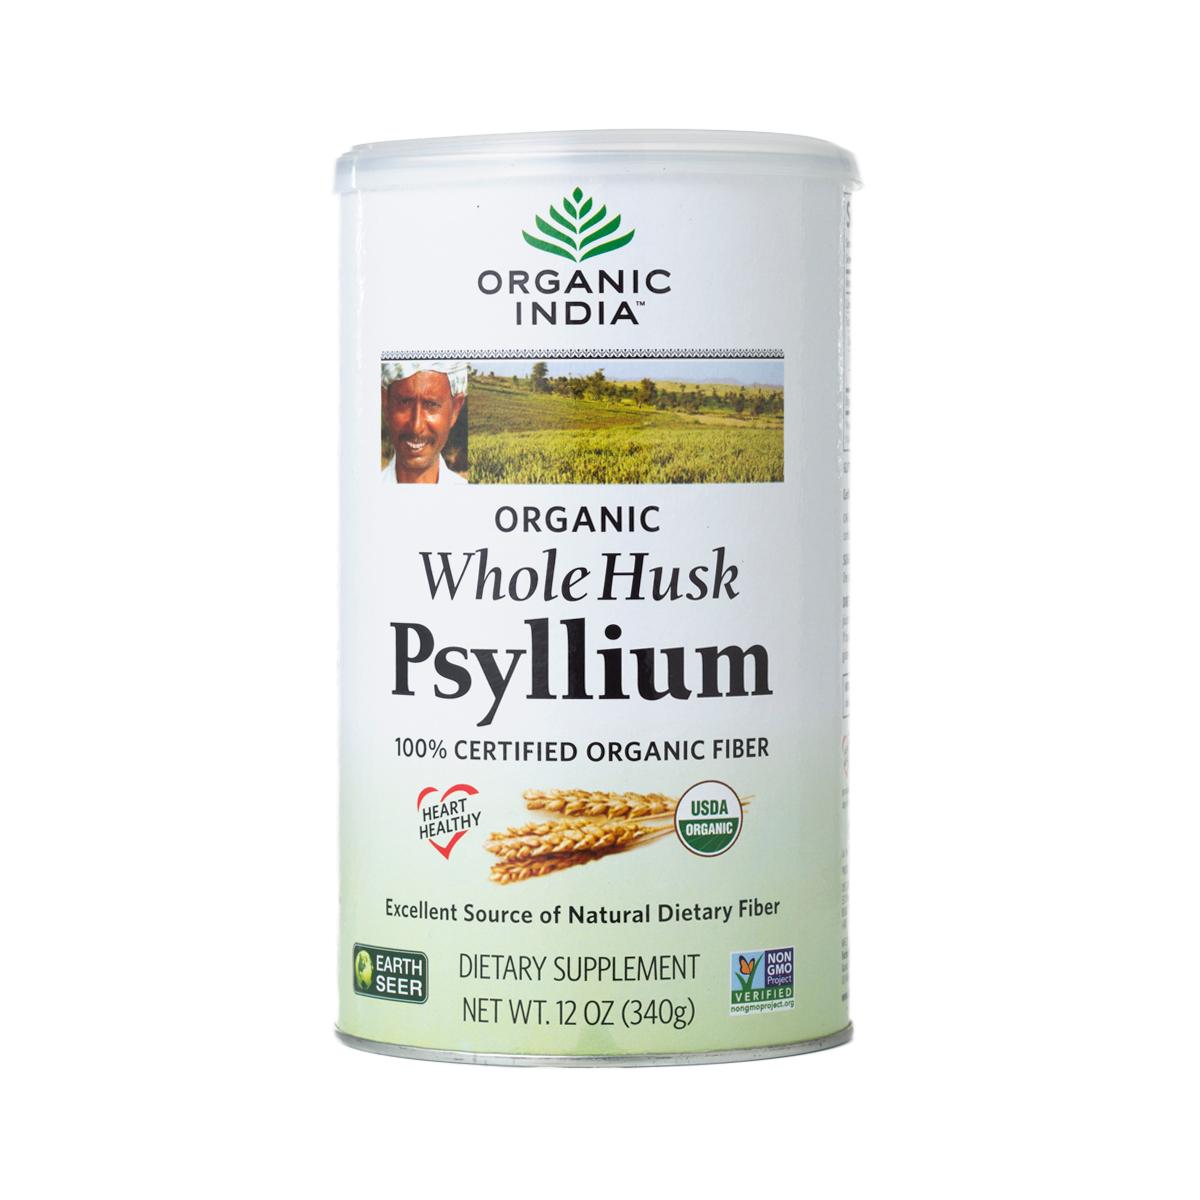 Ground Psyllium Husk Powder Whole Foods